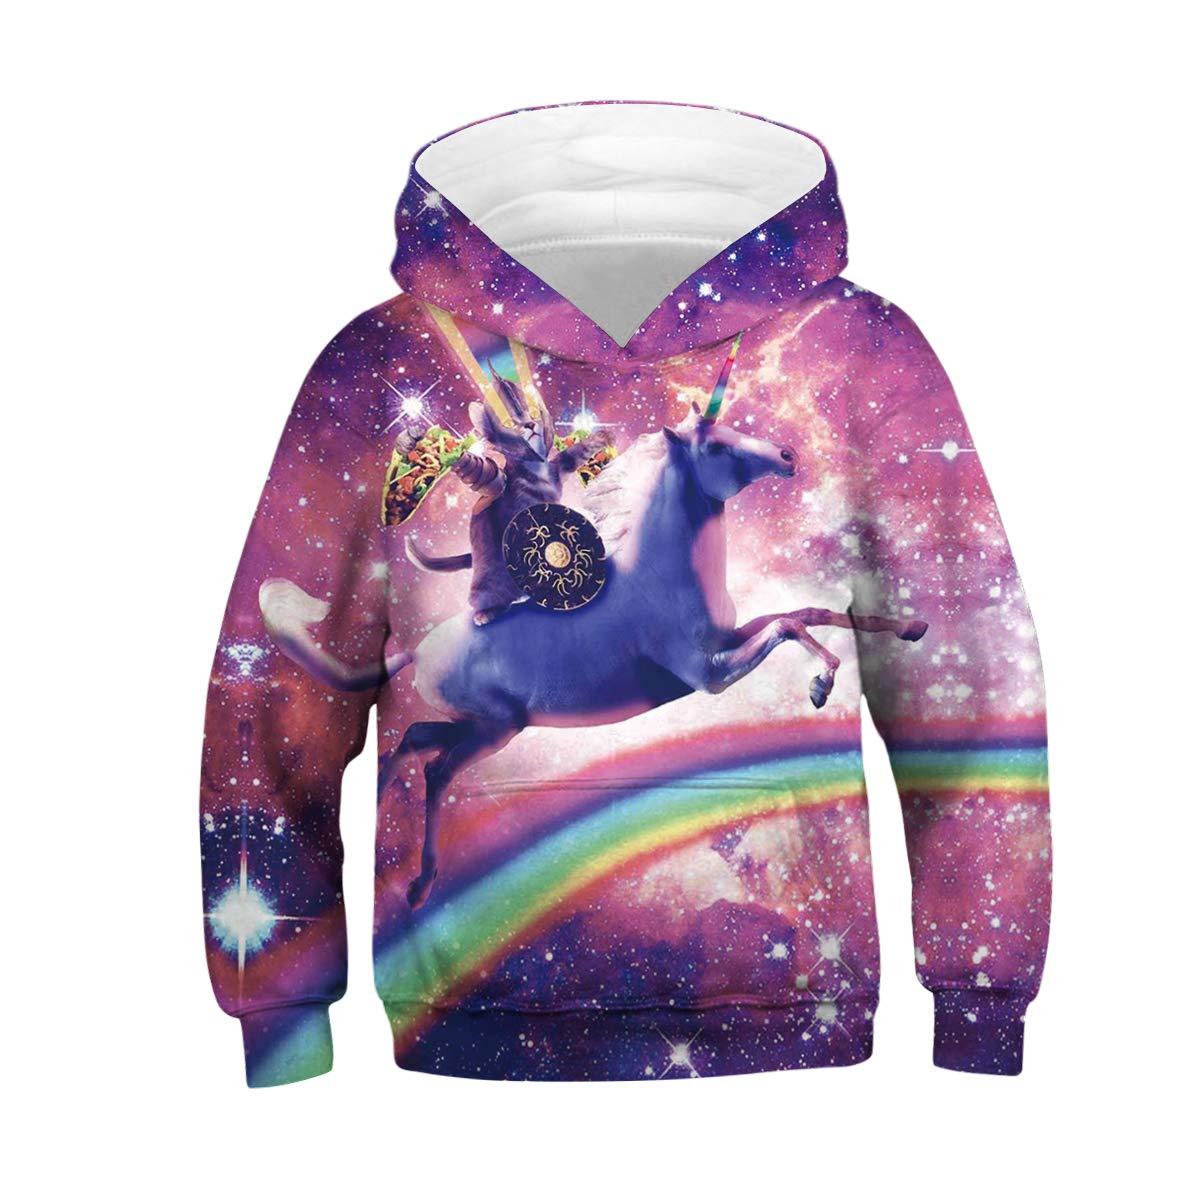 Leezeshaw Unisex Kid's 3D Printed Novelty Hooded Sweatshirt Hoodie with Pocket